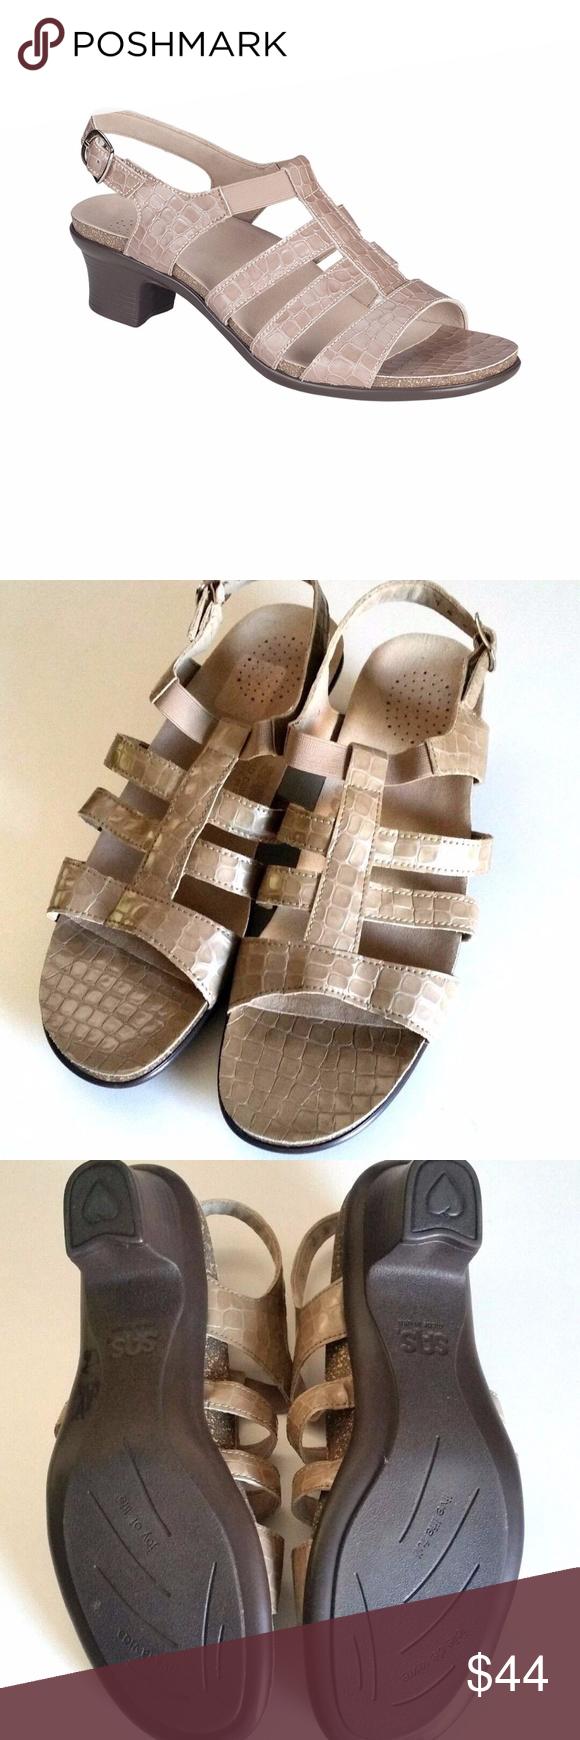 9118f642235ec9 SAS Allegra Taupe Croc Leather Sandal 10 N Women s Allegro - Taupe Croc  Sandals. Retails